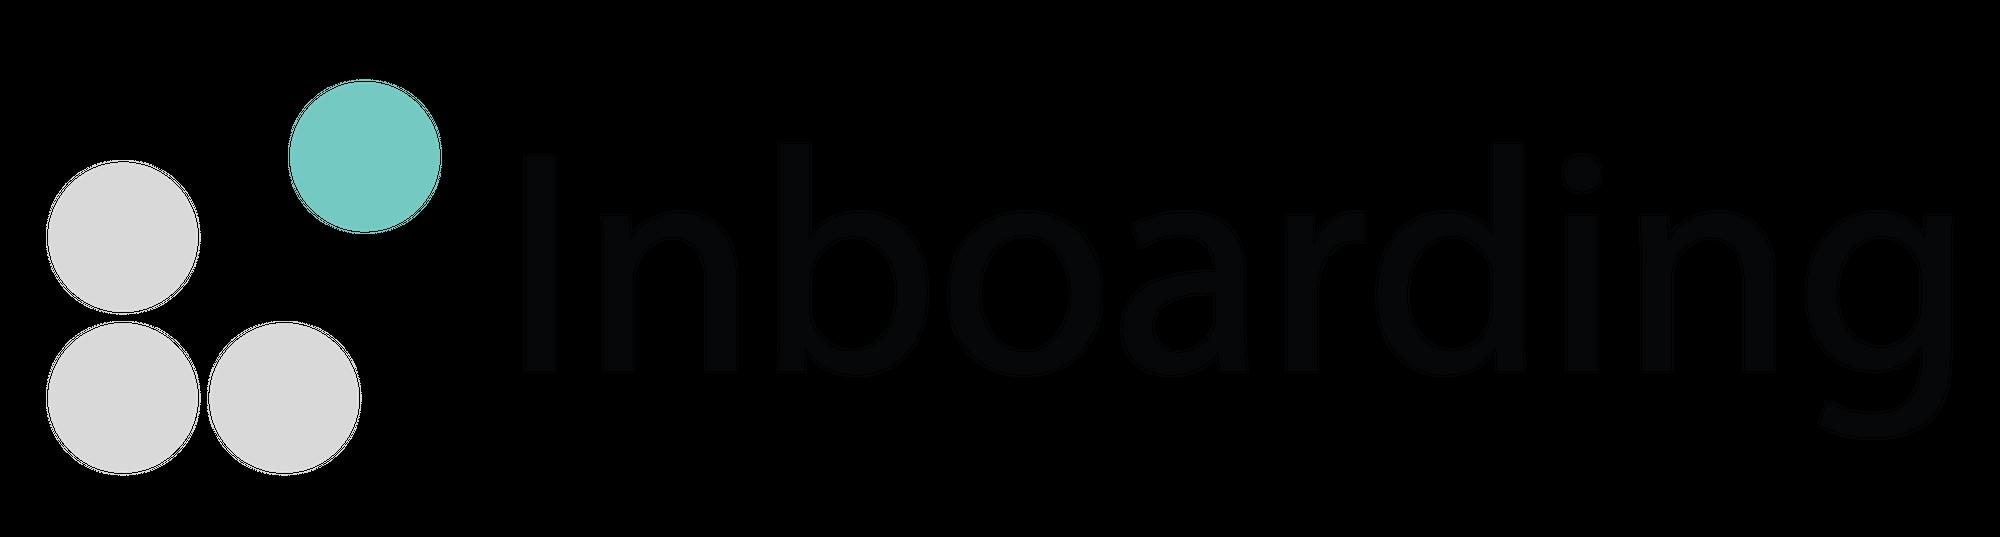 Inboarding